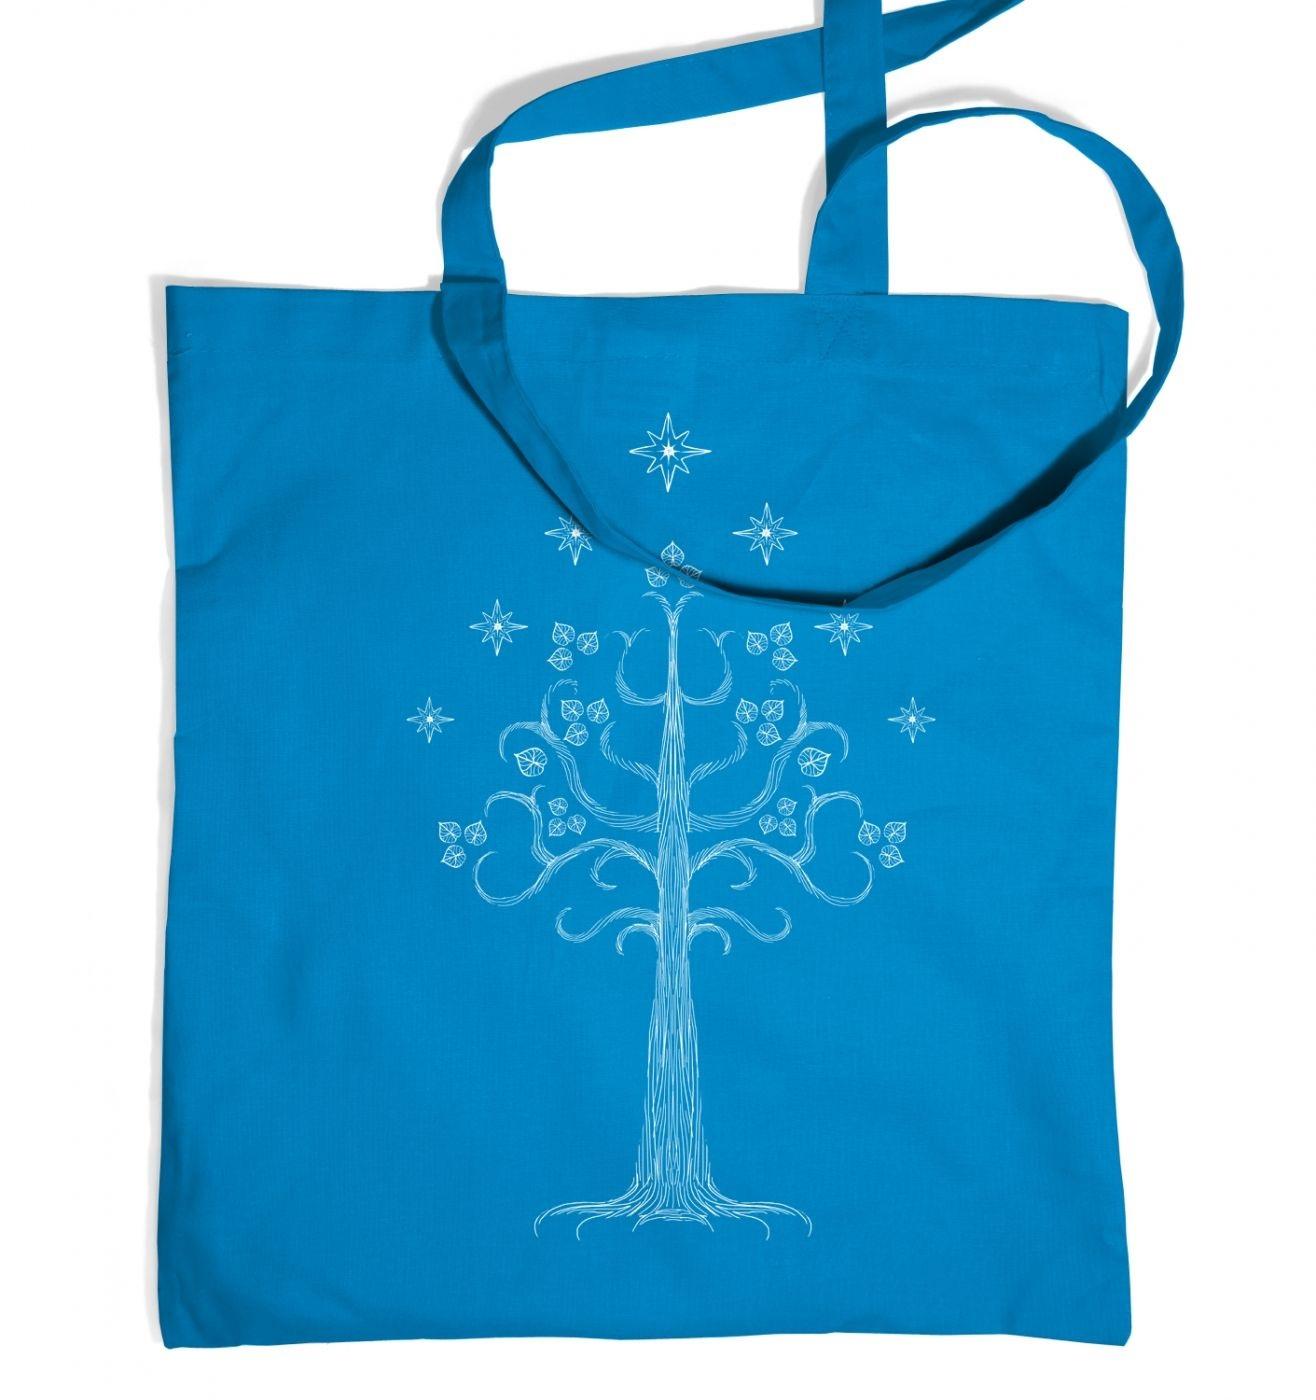 White Tree of Gondor tote bag